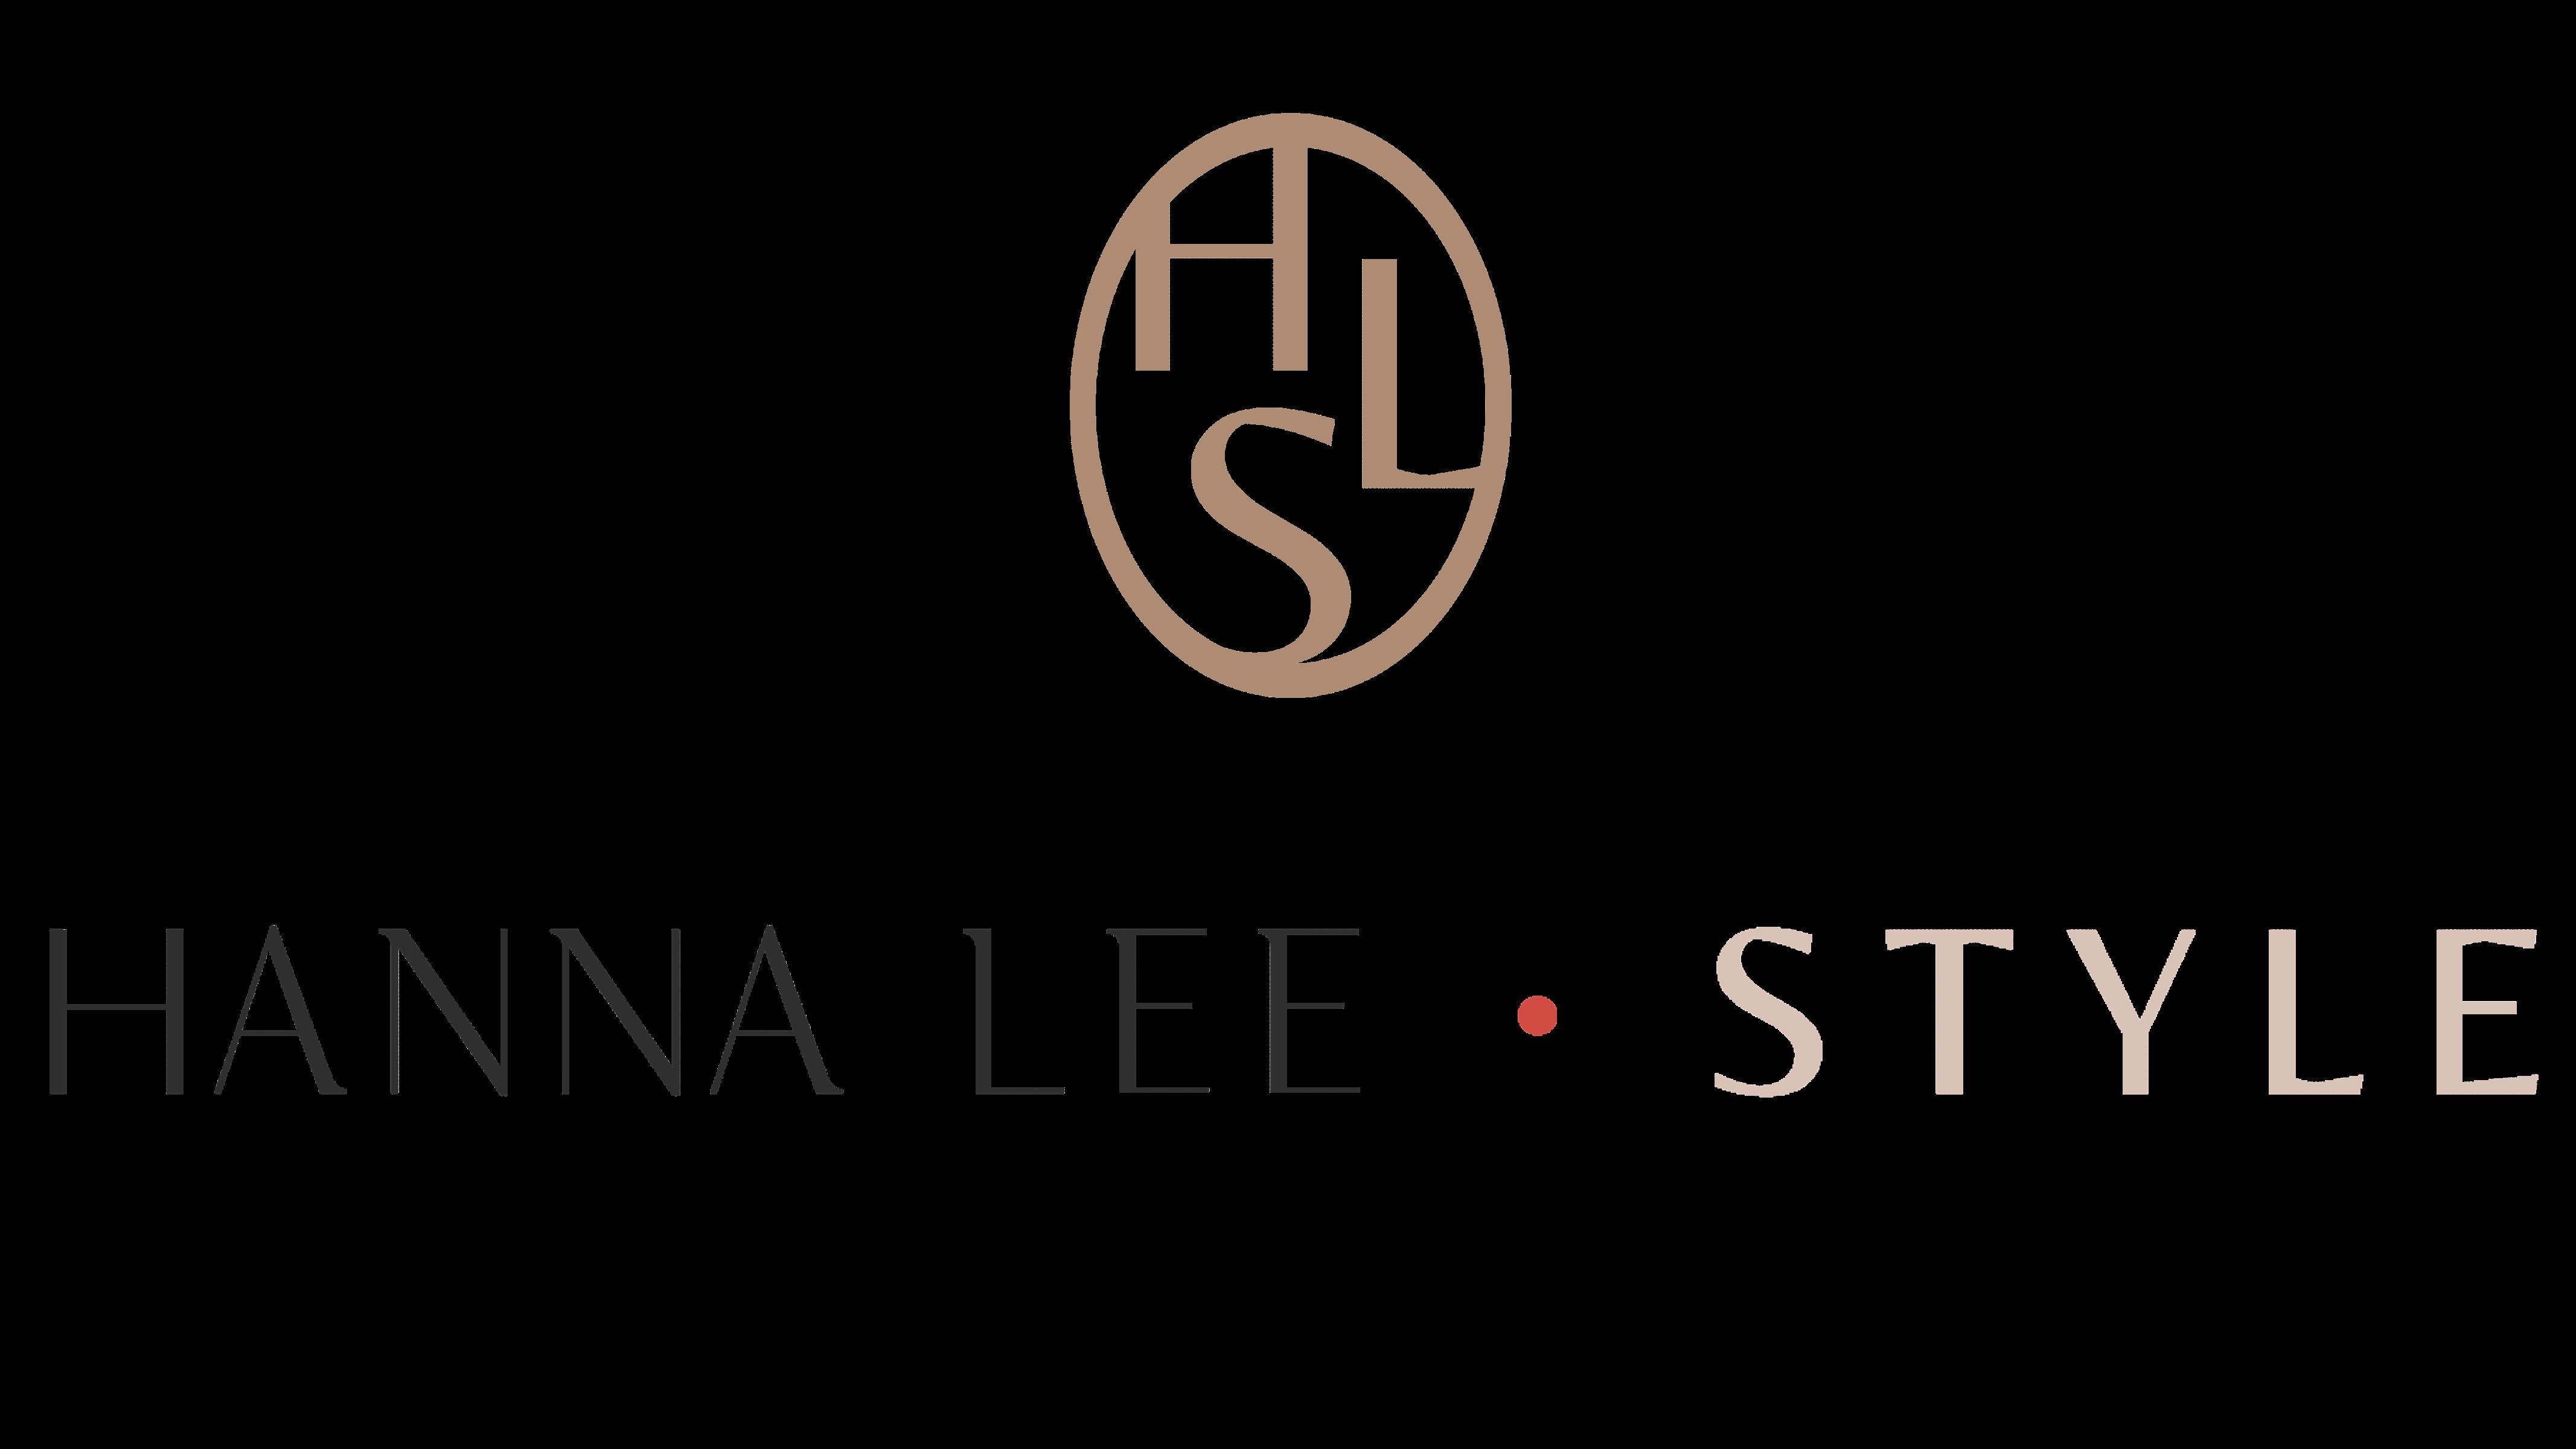 Hanna Lee Style